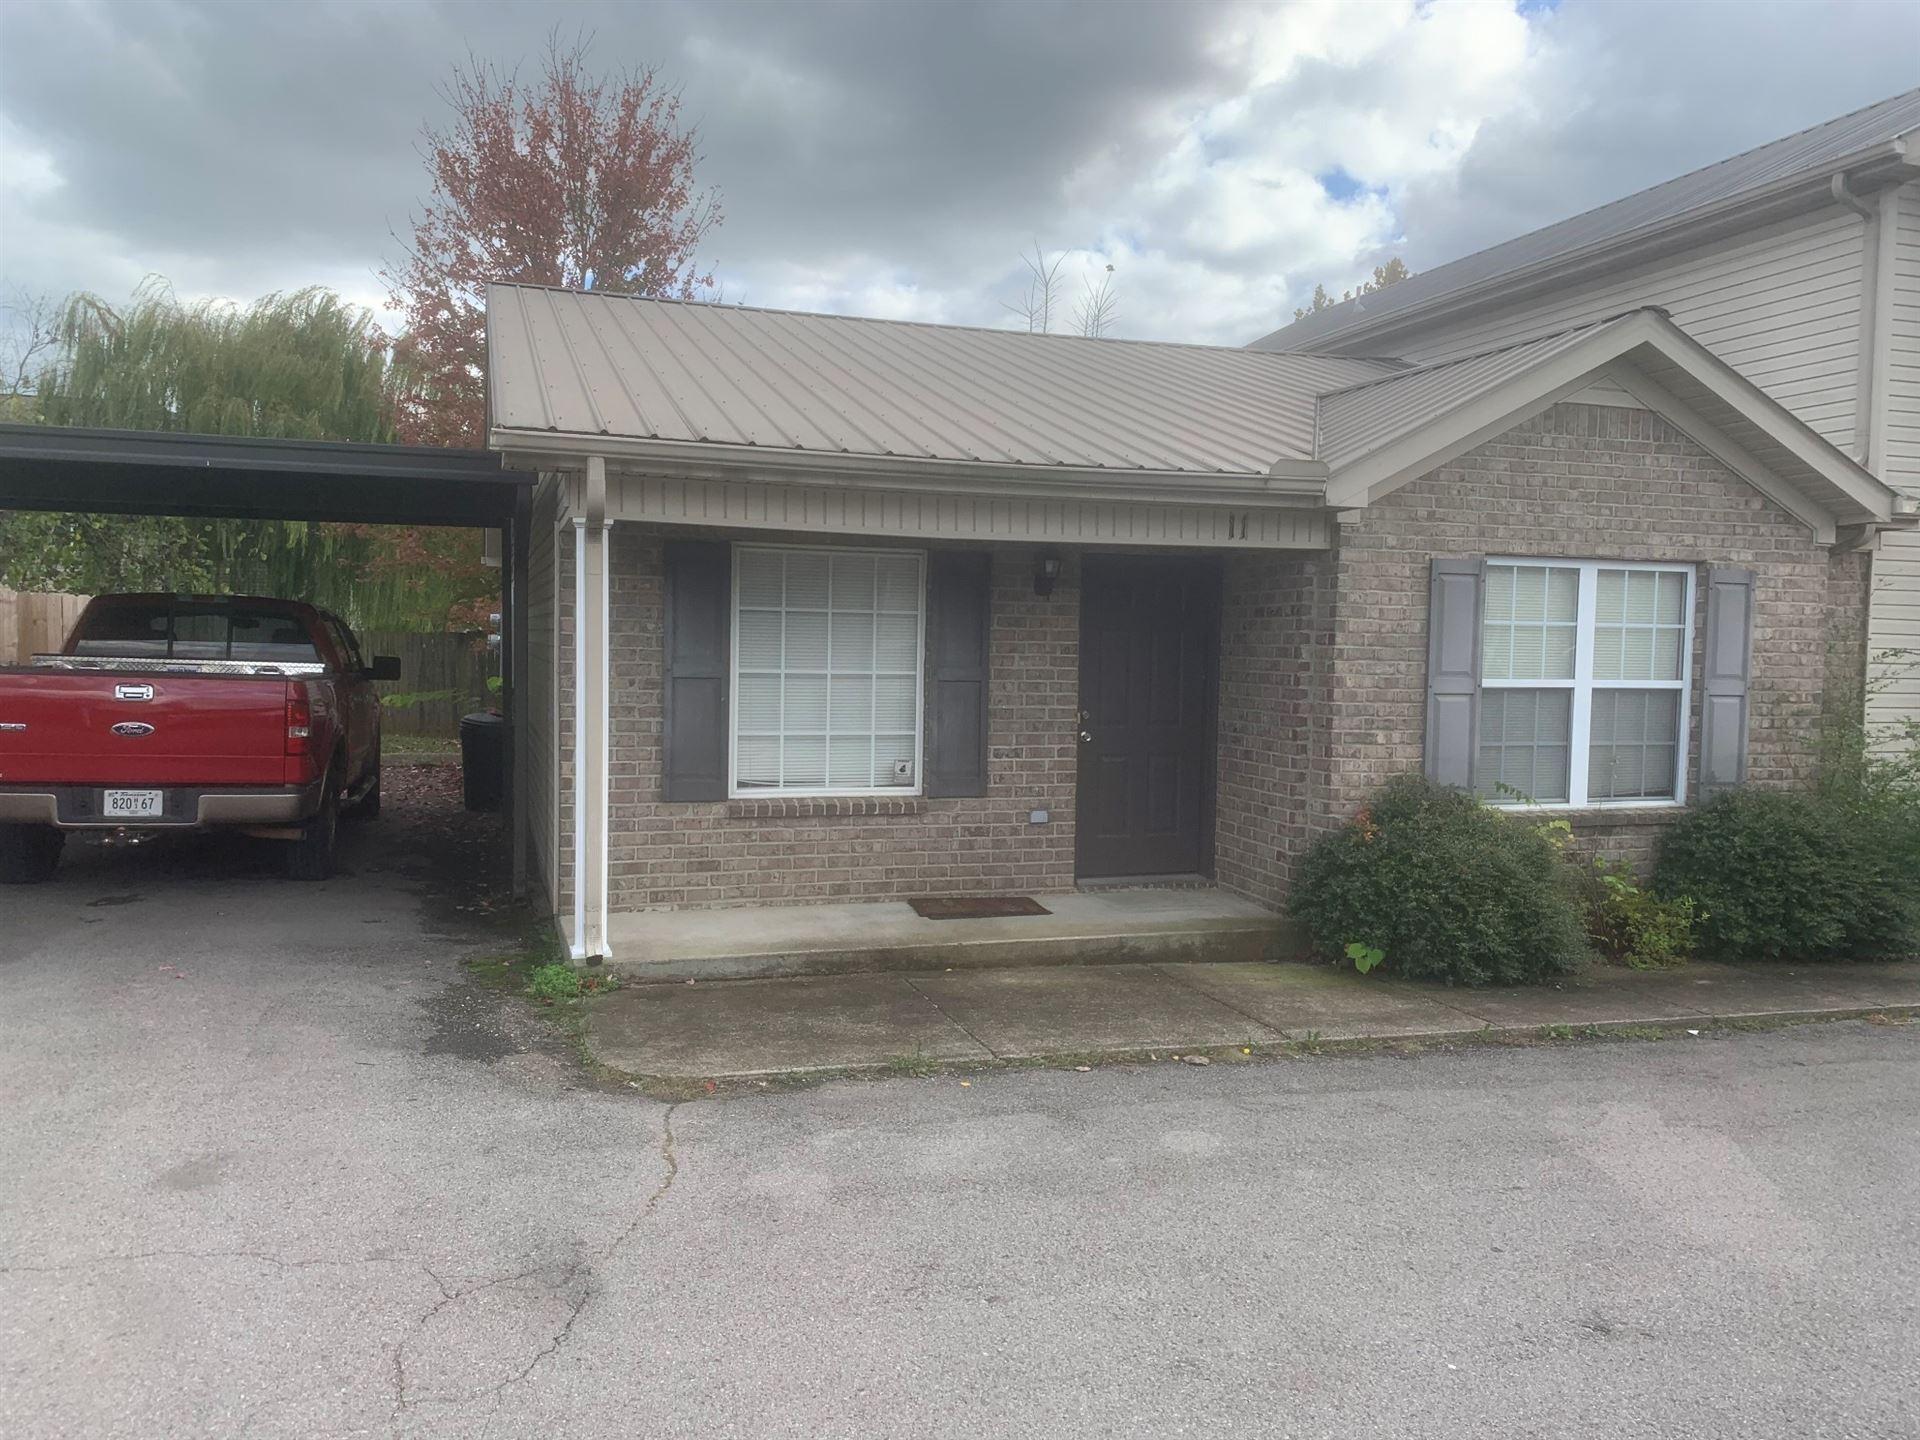 465 Warrior Dr #11, Murfreesboro, TN 37128 - MLS#: 2210184